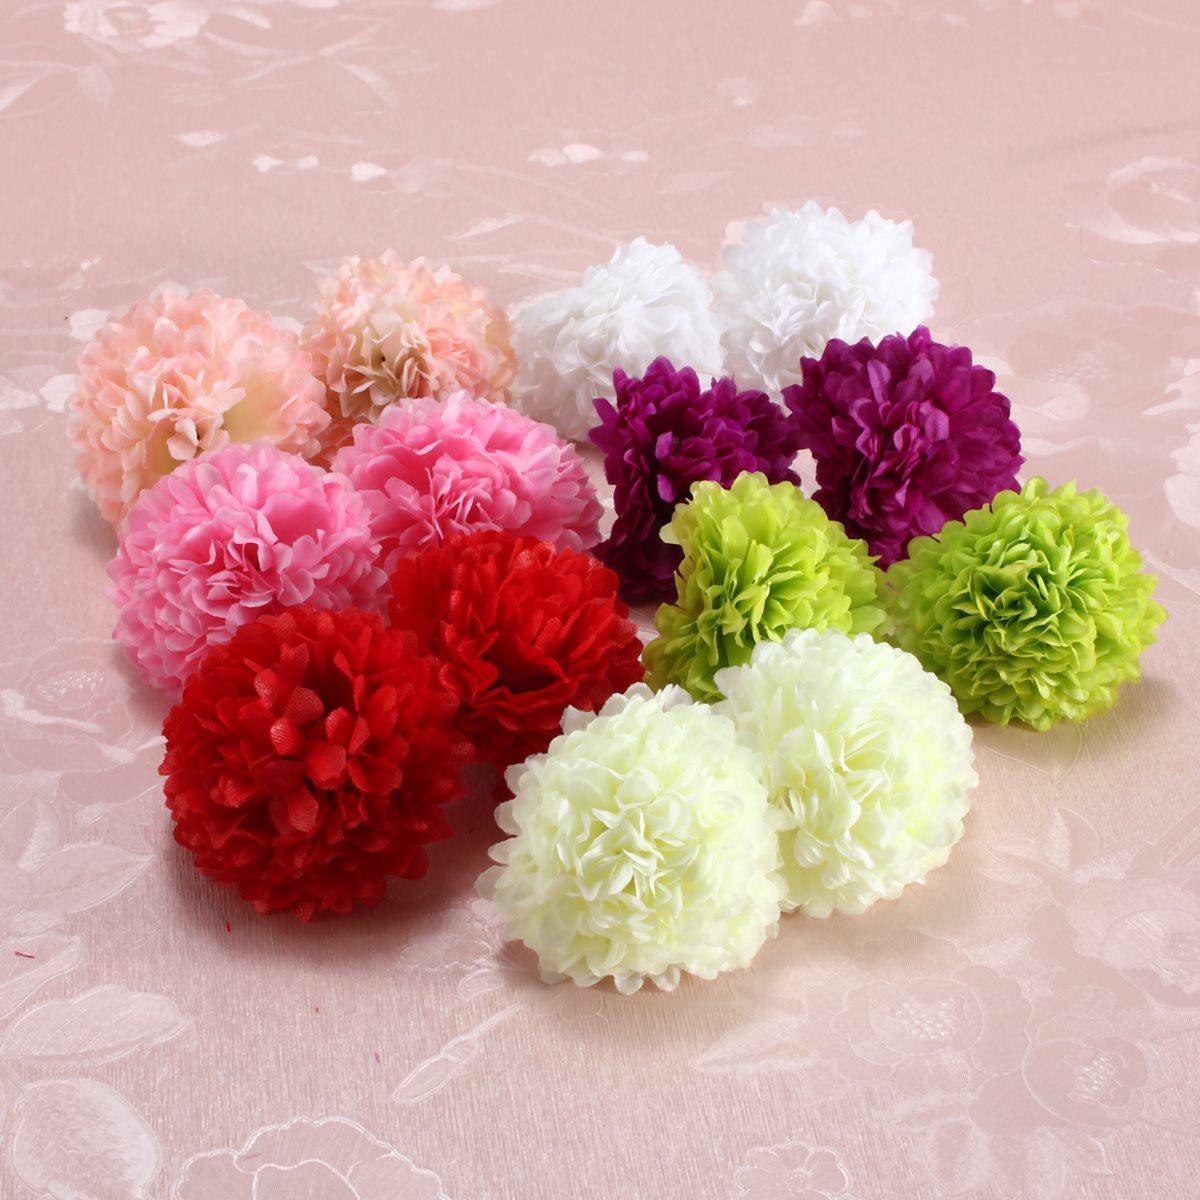 10 Pcs Artificial Small Clove Carnation Flowers Artificial Flowers